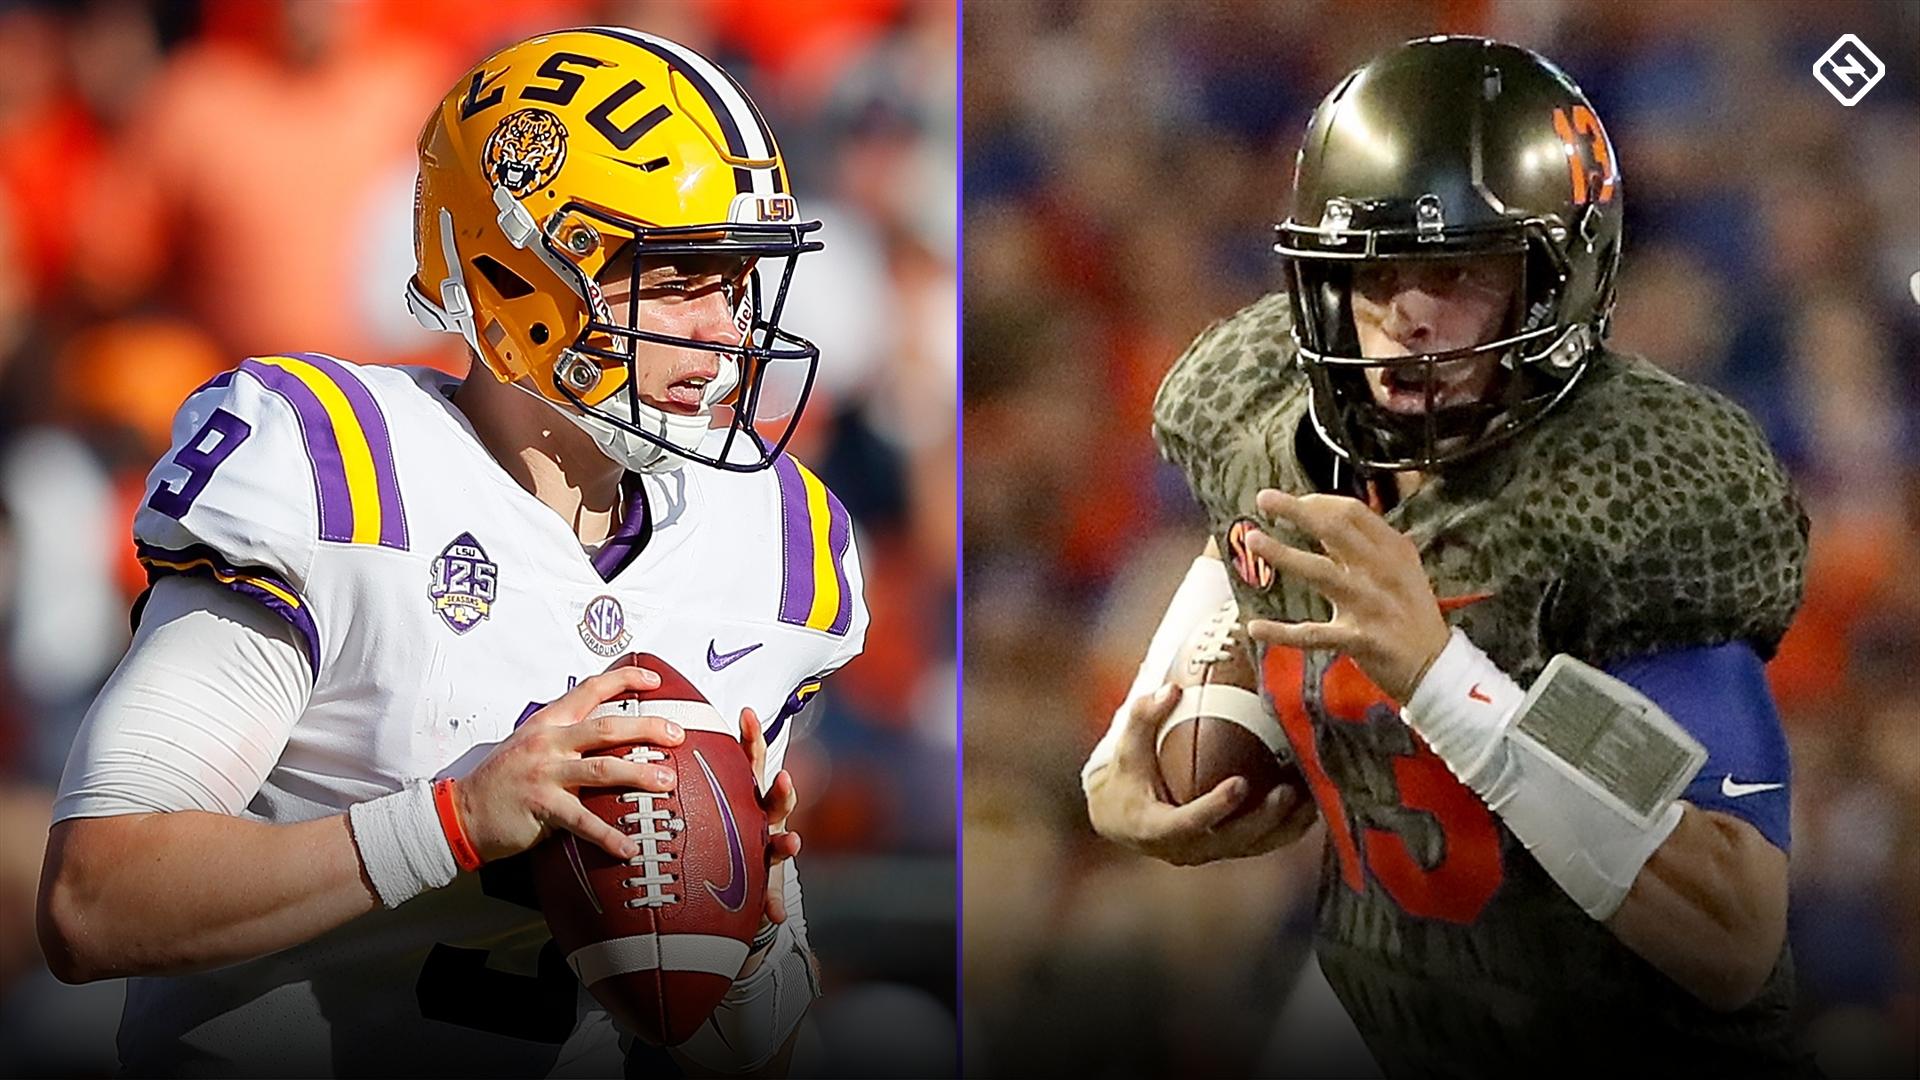 College Football Picks Against the Spread: Week 13